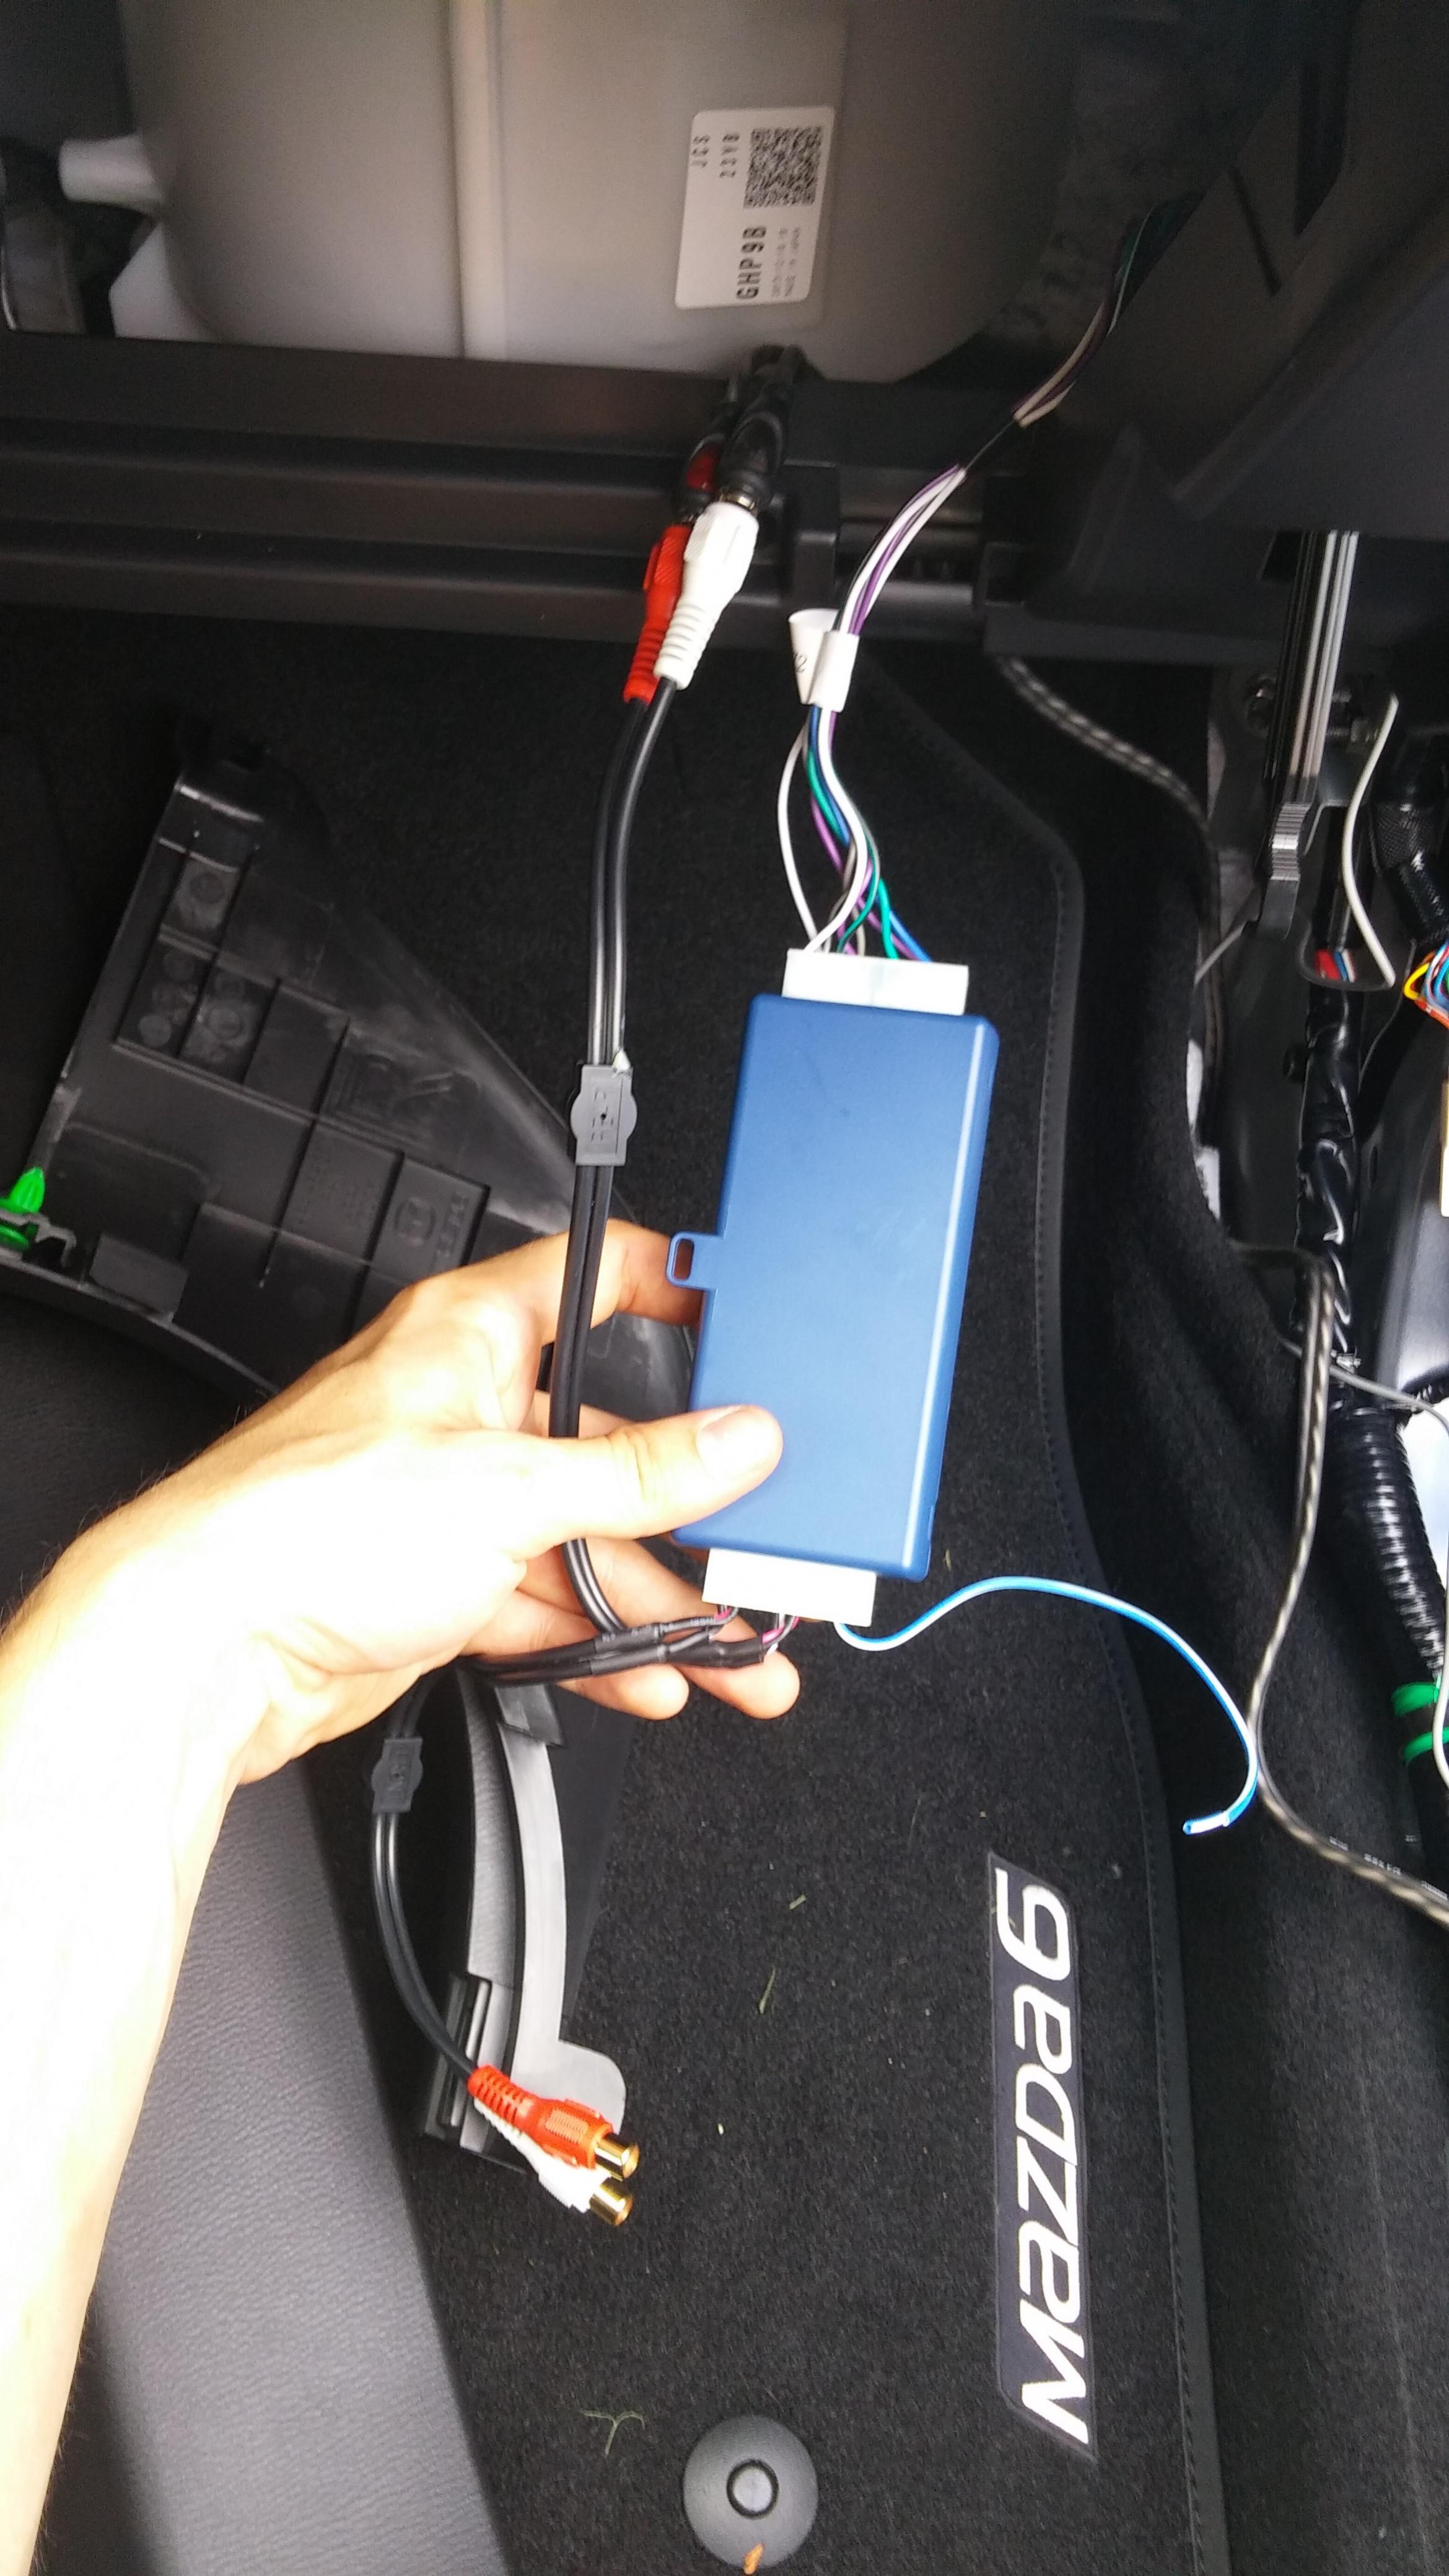 wiring a plug image 6